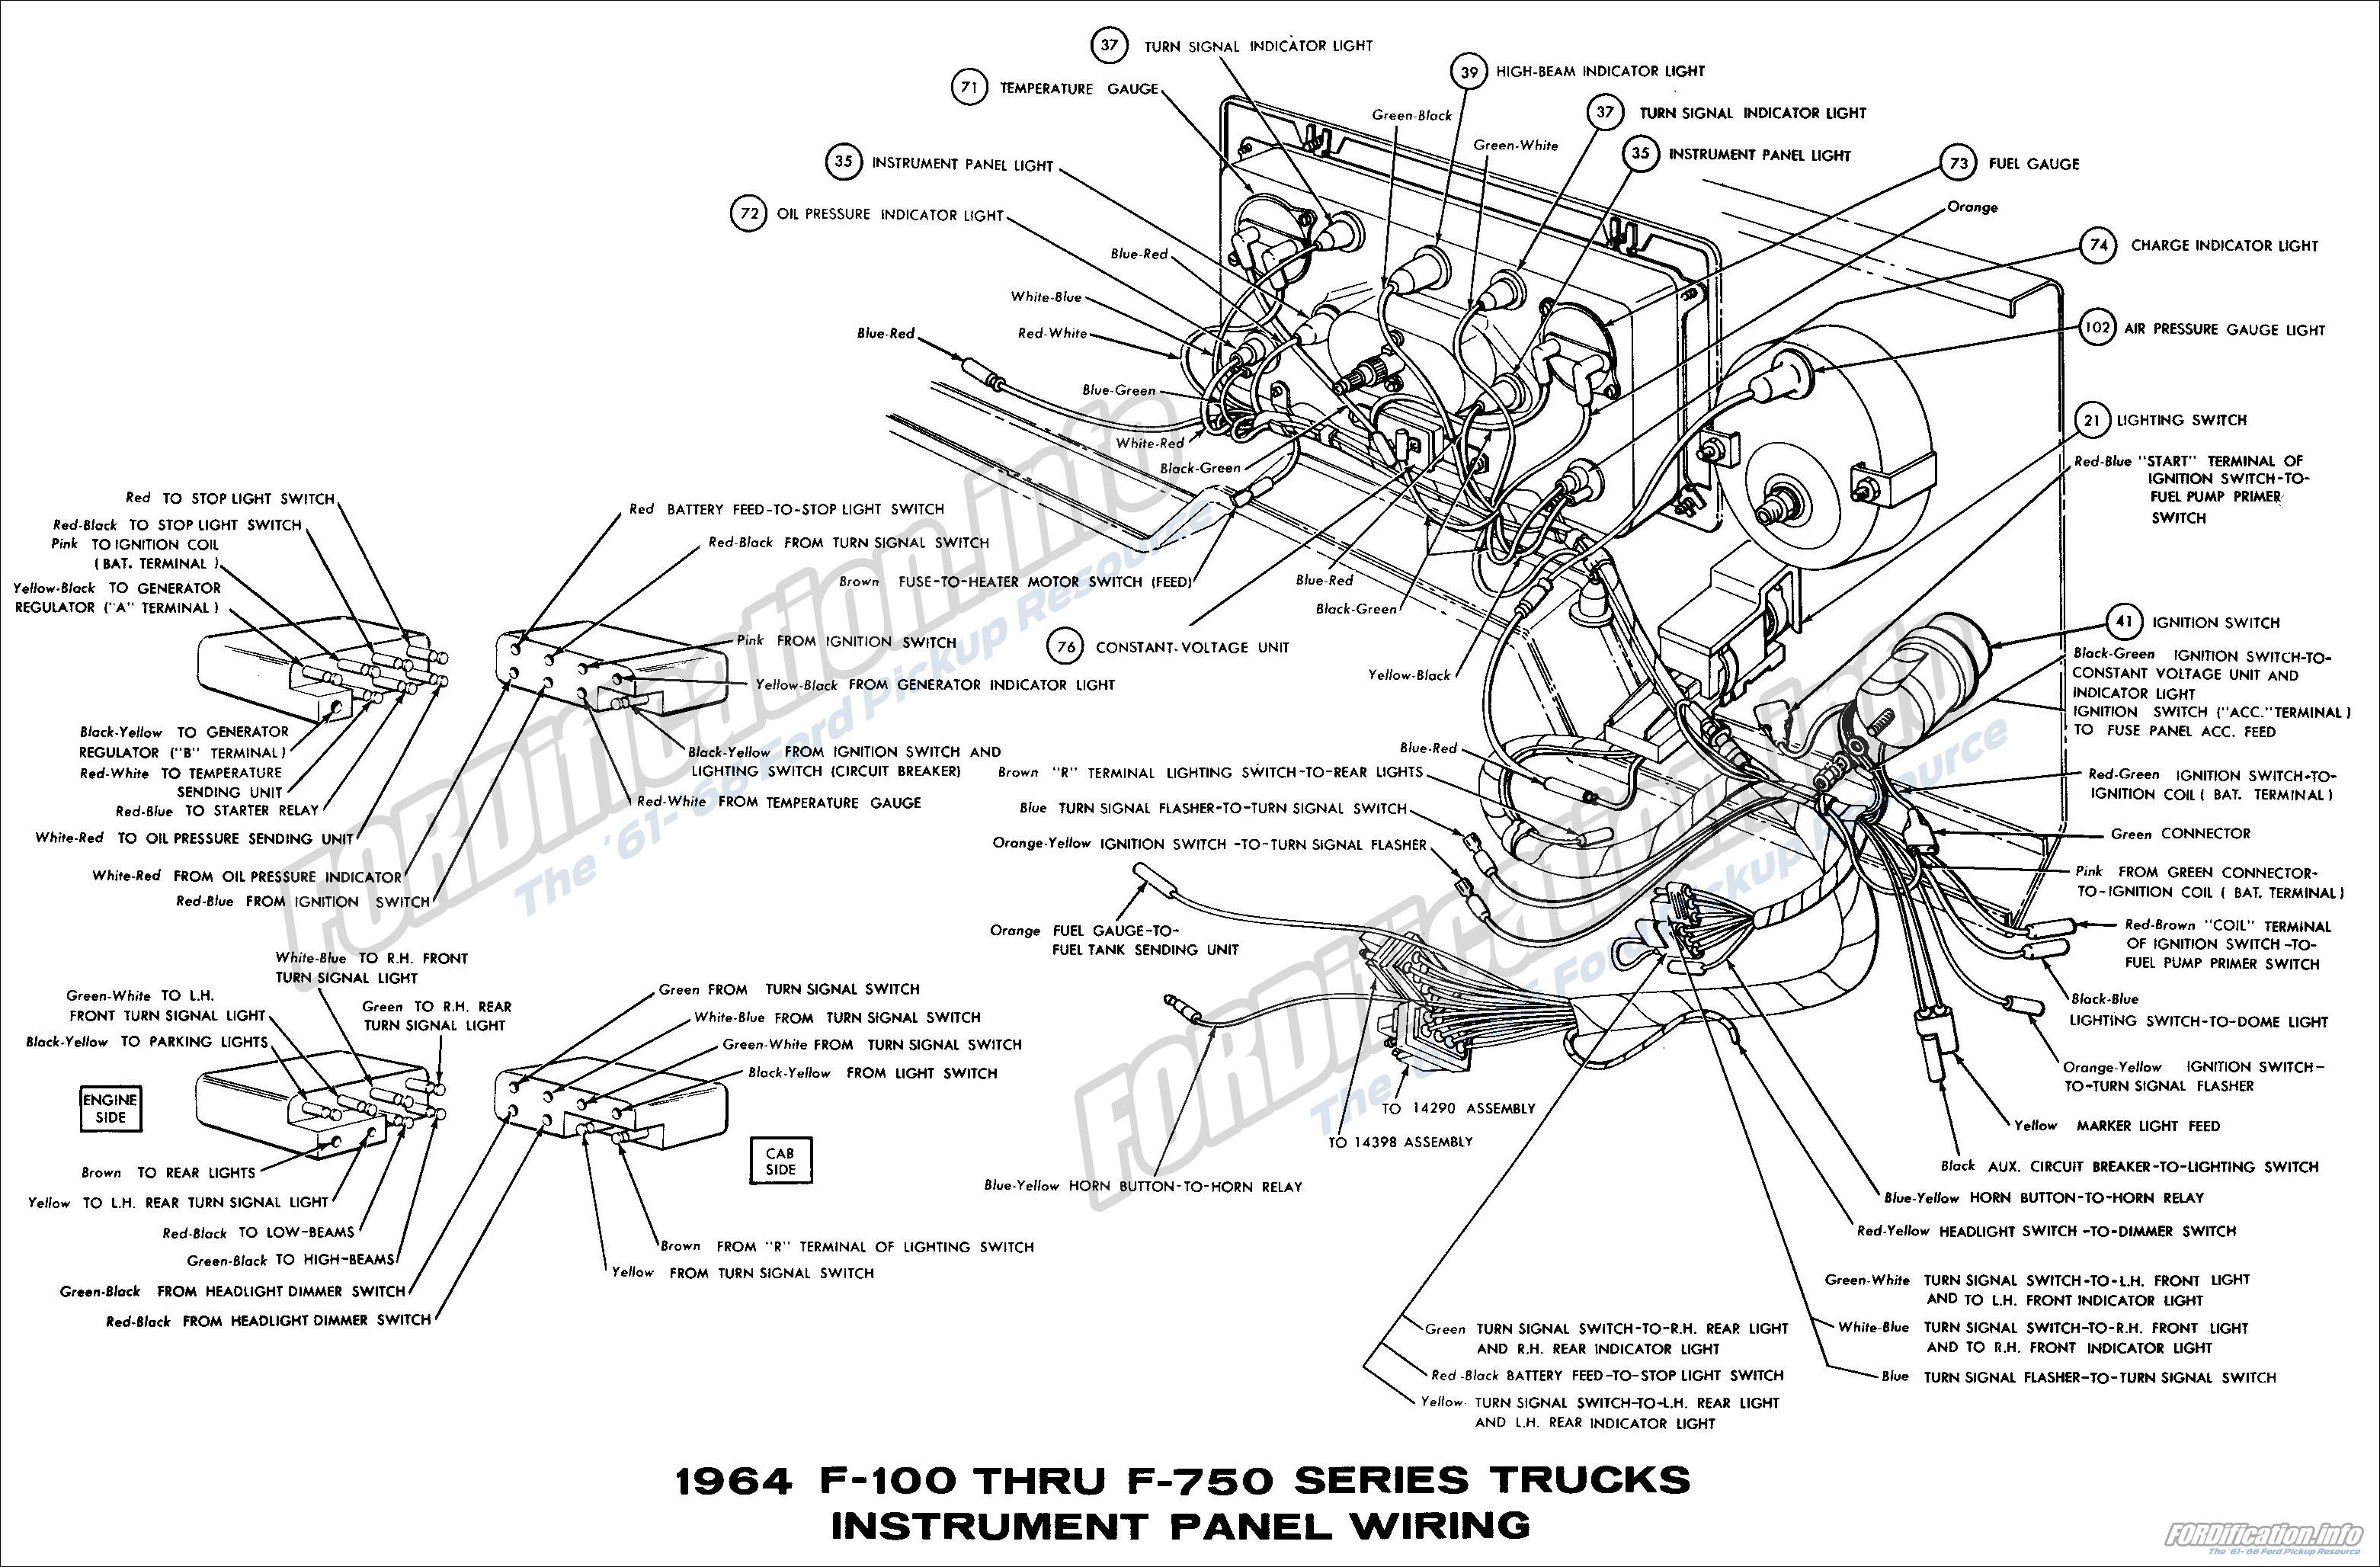 deh p6800mp wiring diagram